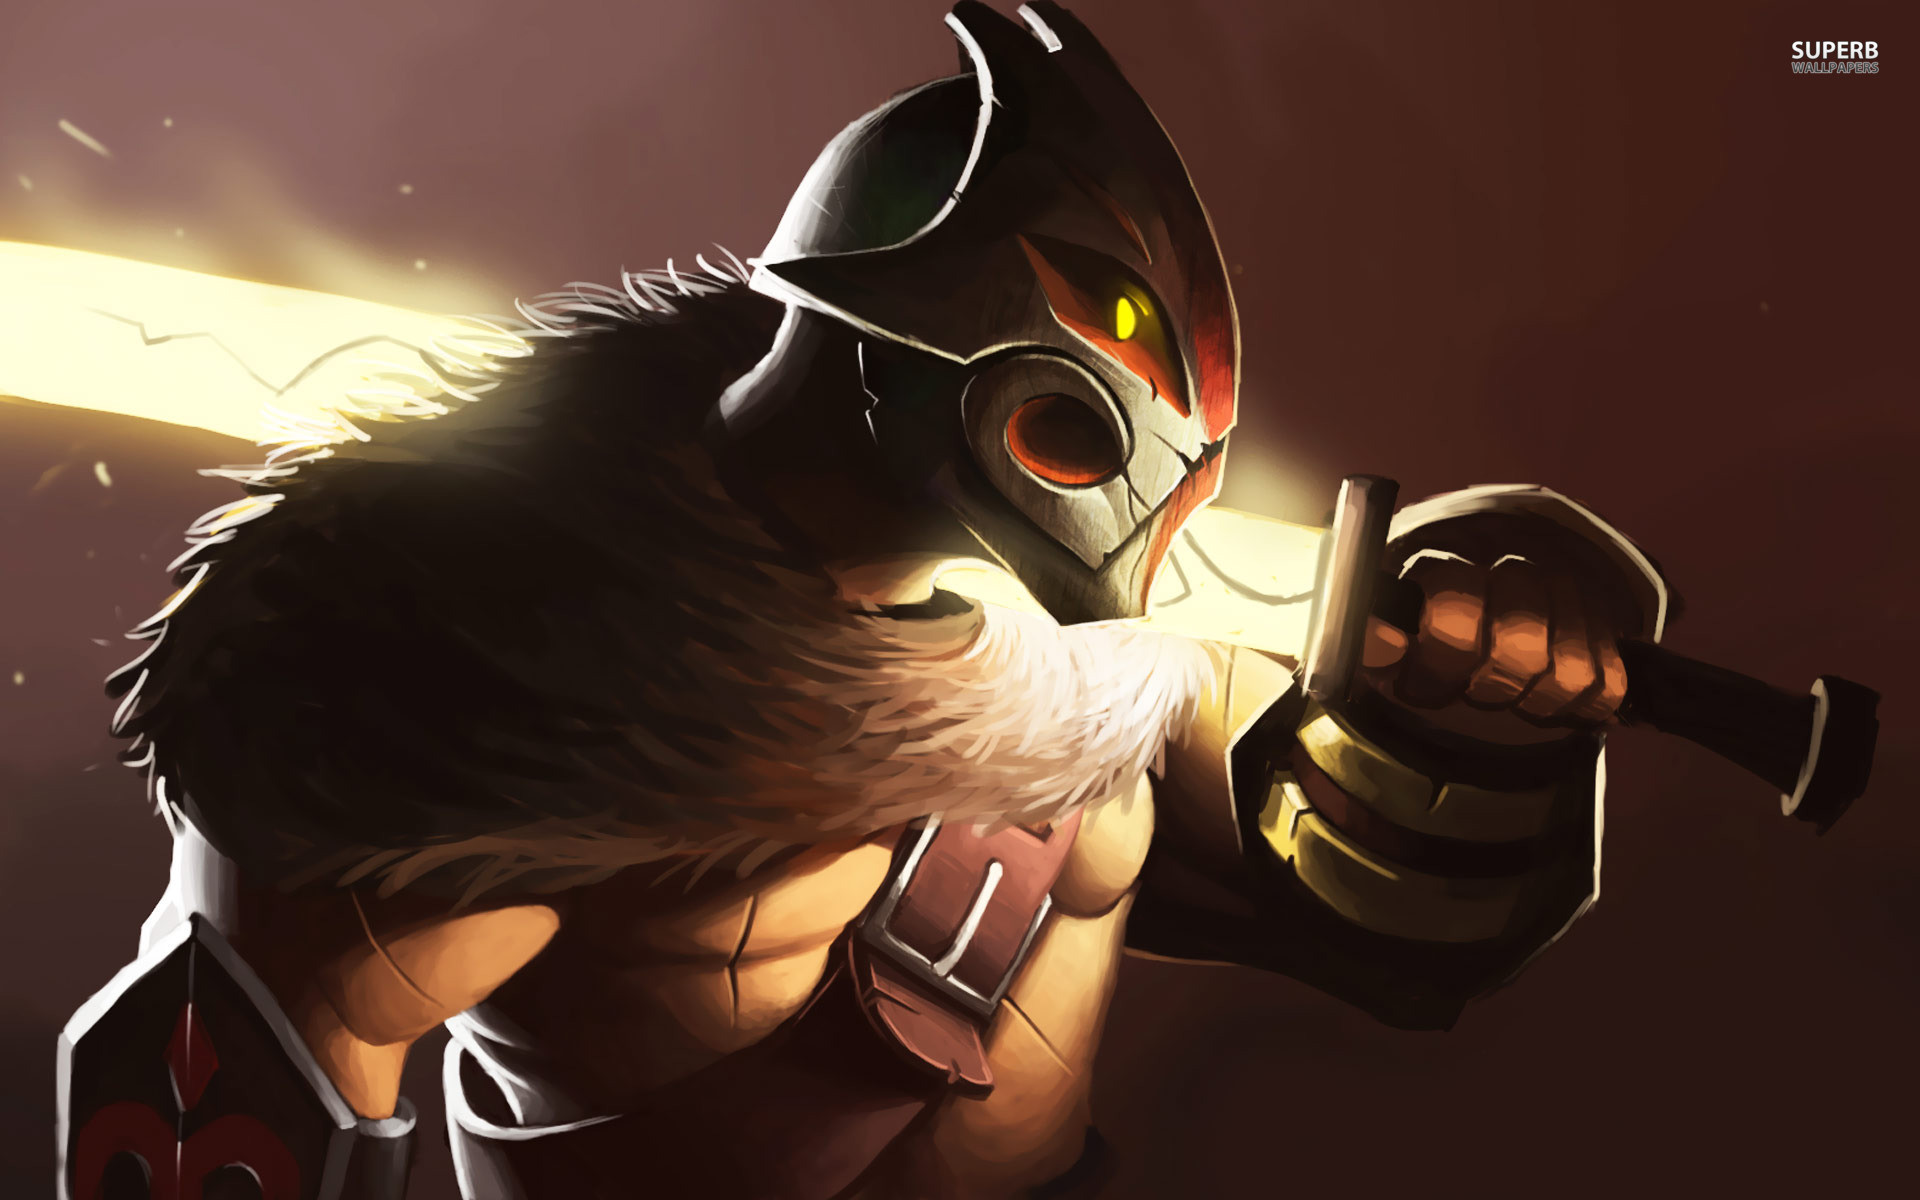 Dragon Knight Dota 2 Wallpaper - Dota 2 Hero Juggernaut , HD Wallpaper & Backgrounds